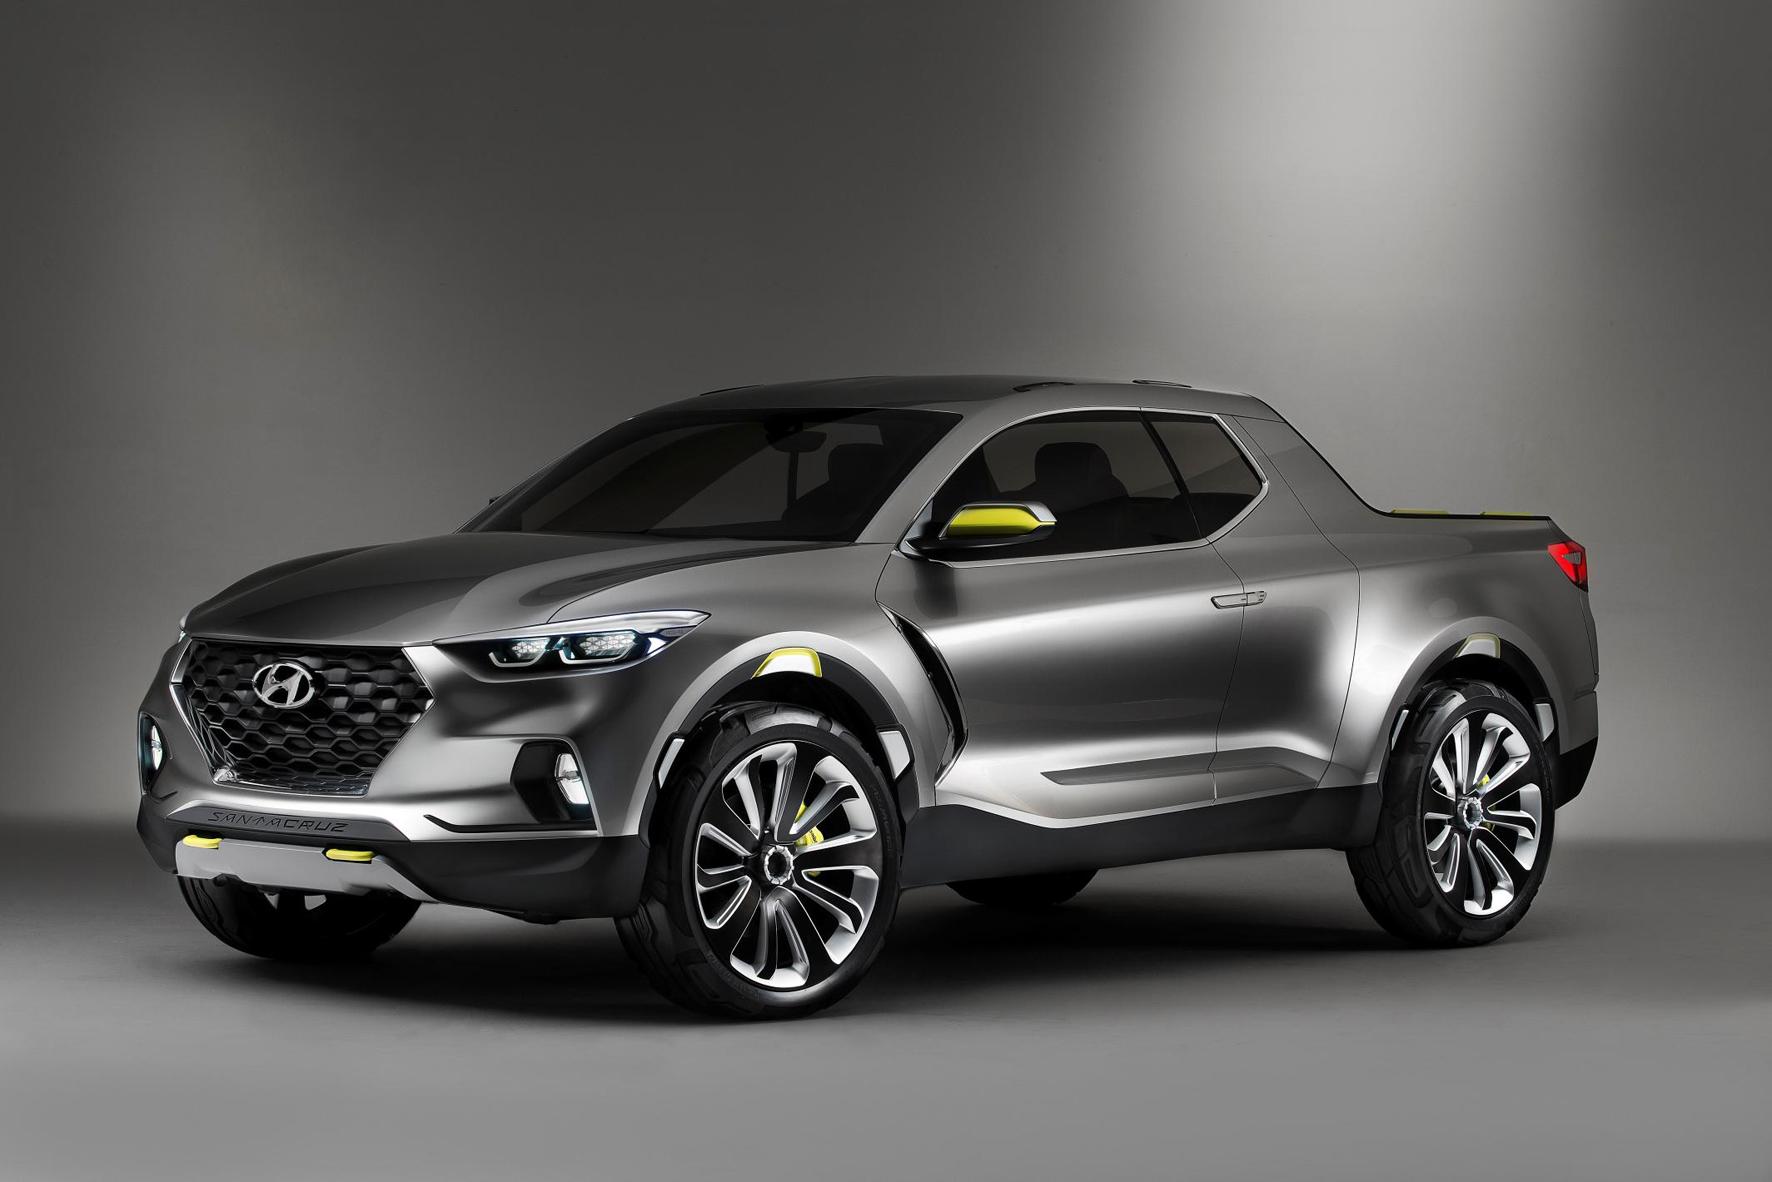 2015 Hyundai Santa Cruz concept (Detroit, North American International Auto Show)